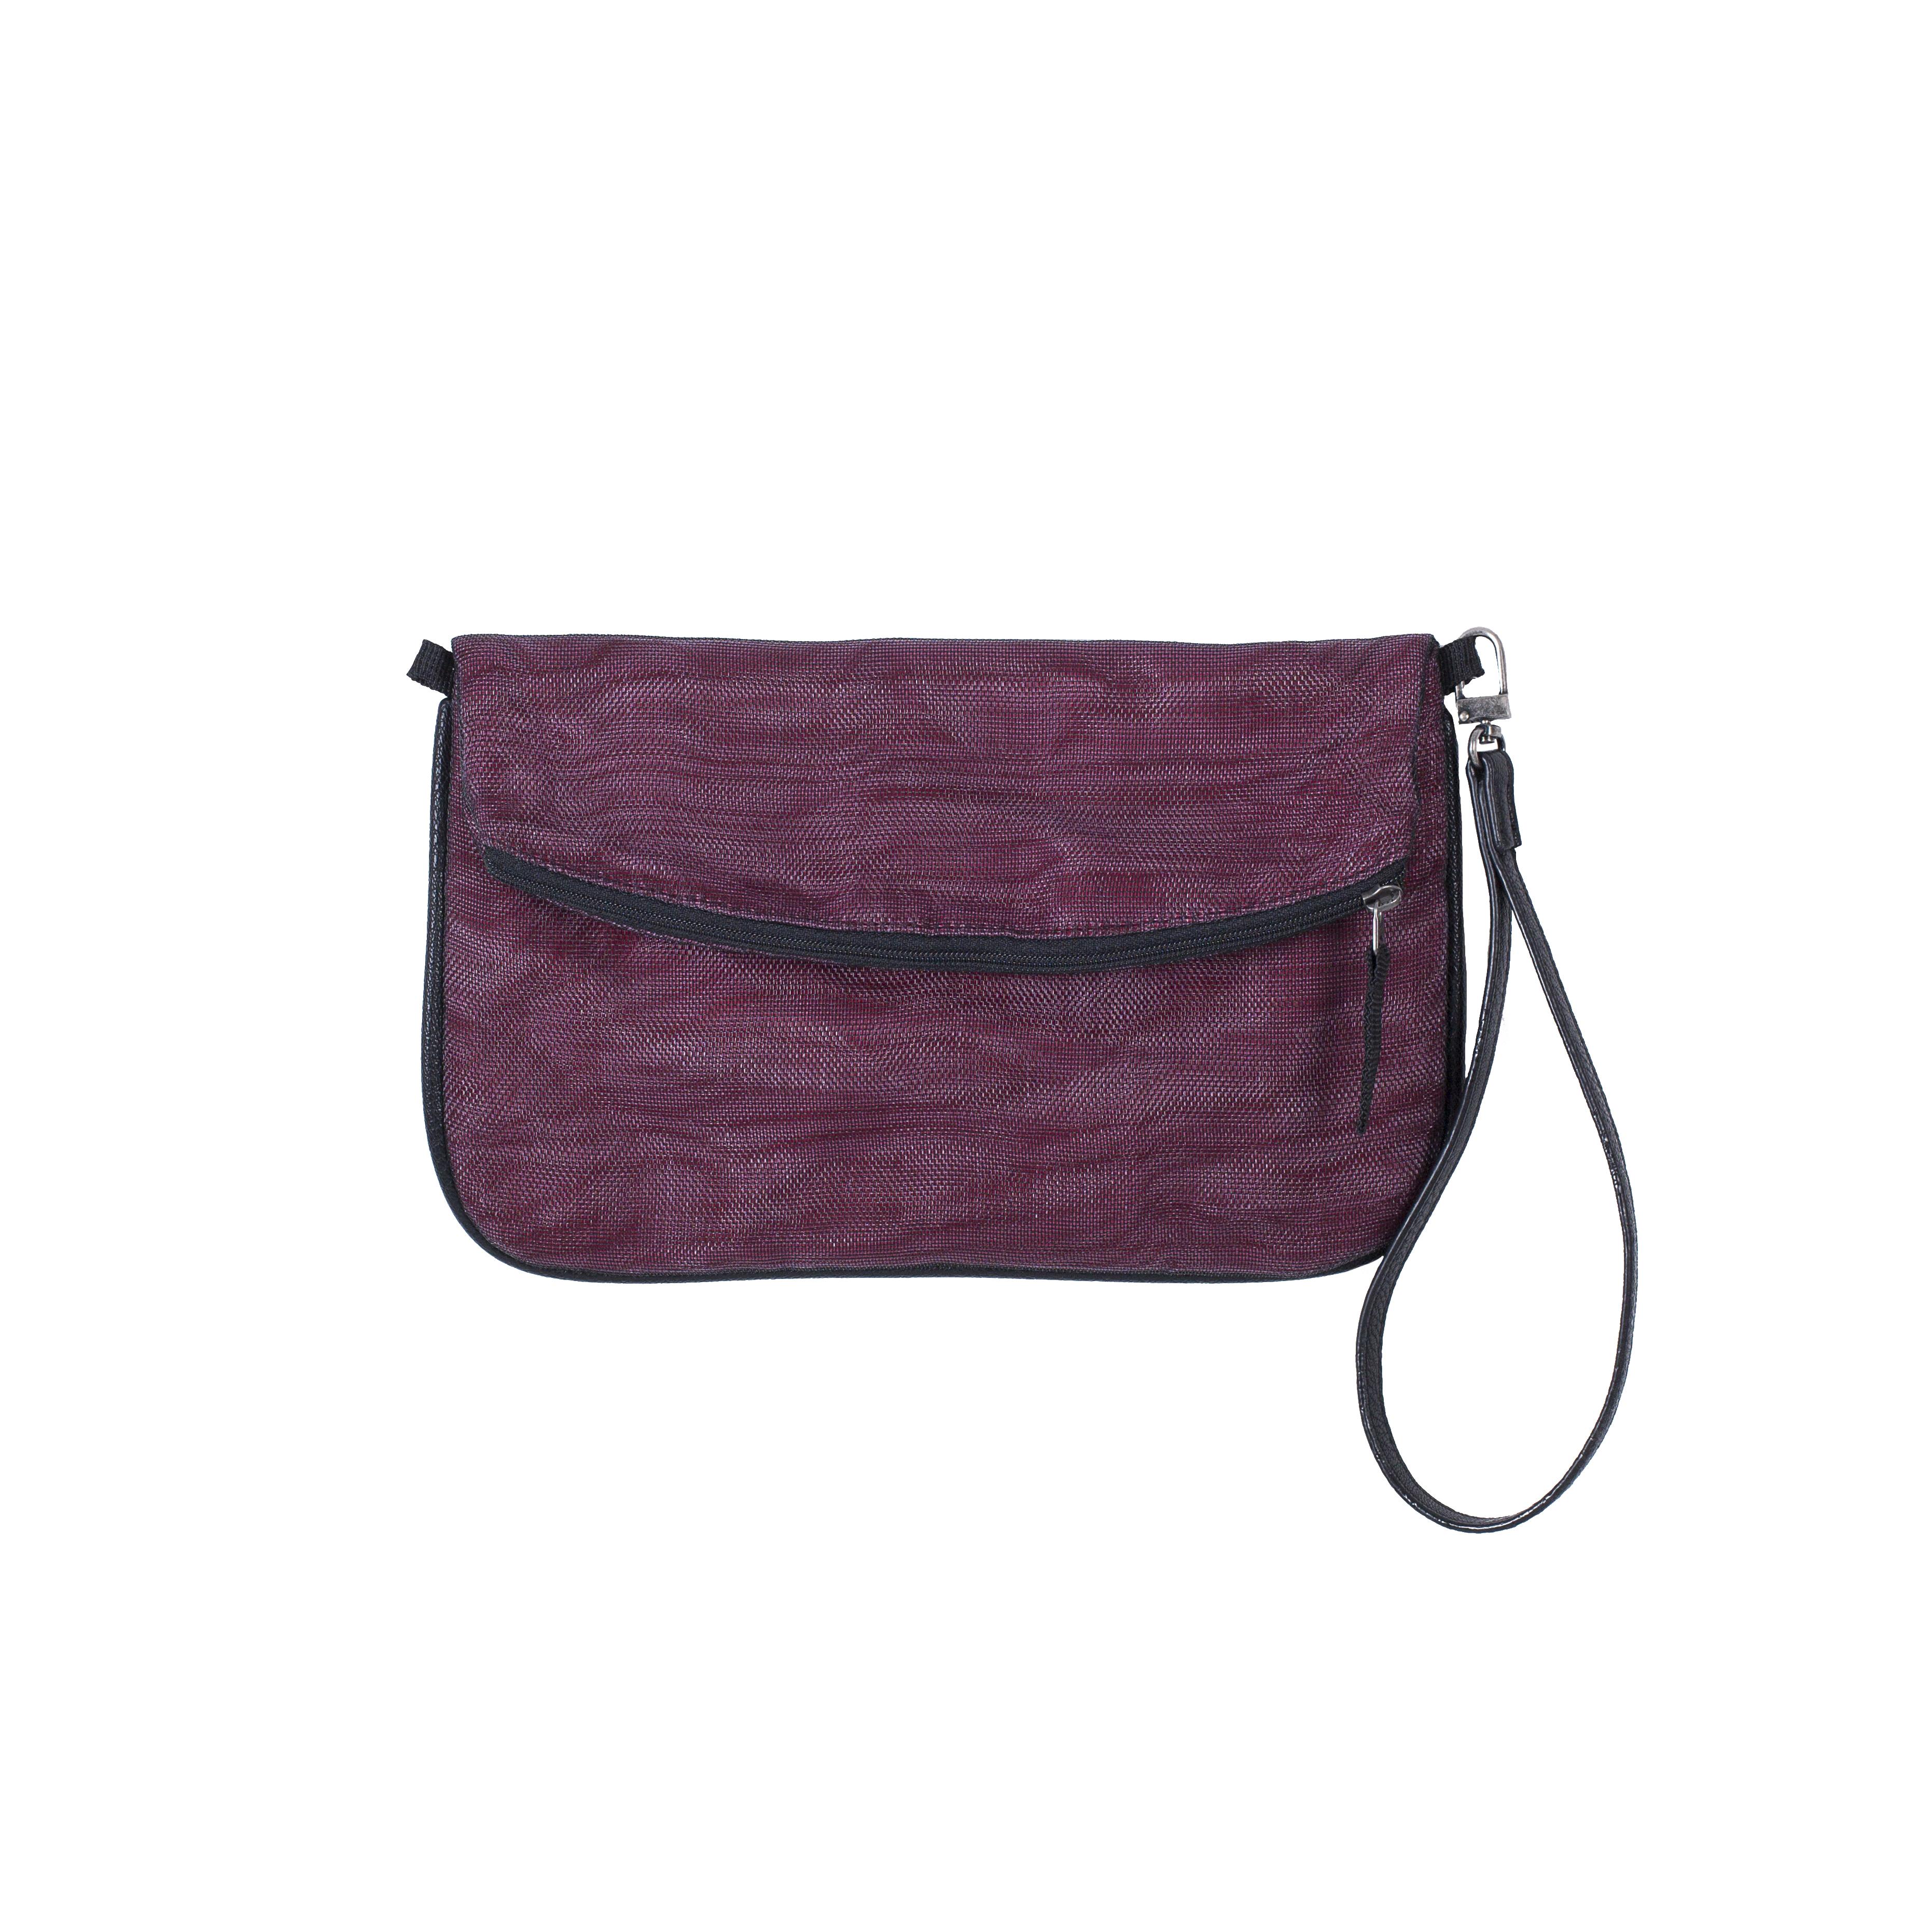 Sophea - Ethical Strap Wallet - Burgundy